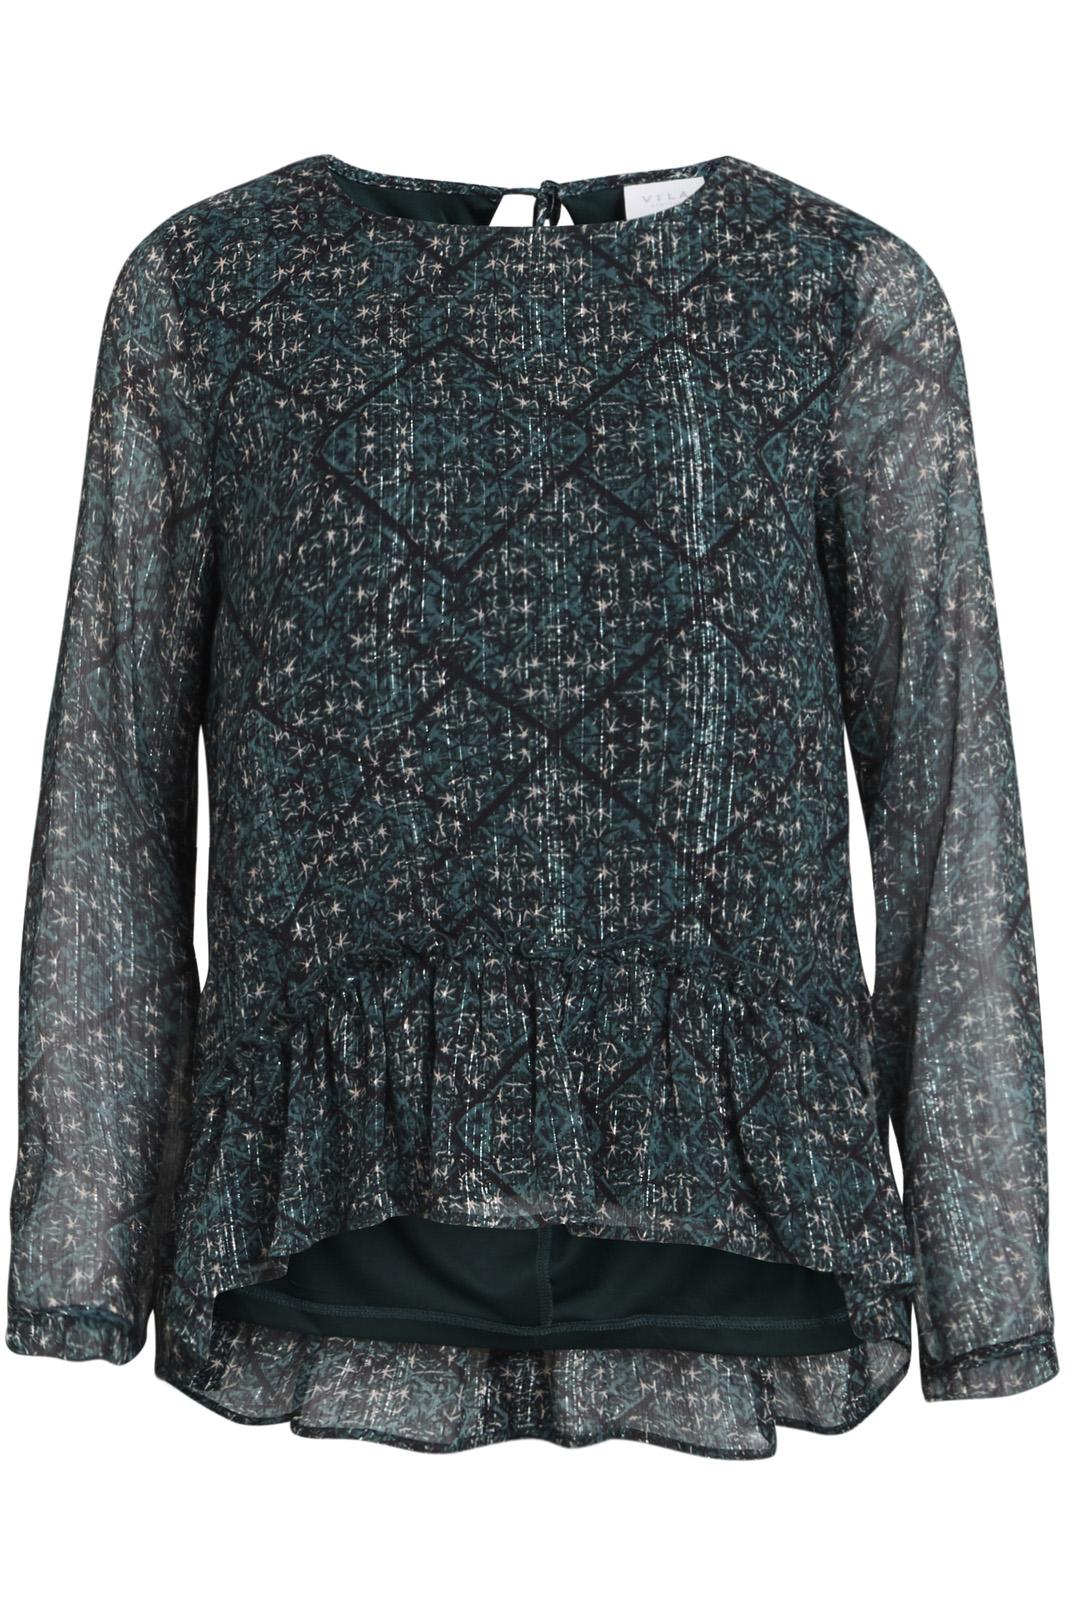 VILA blouse